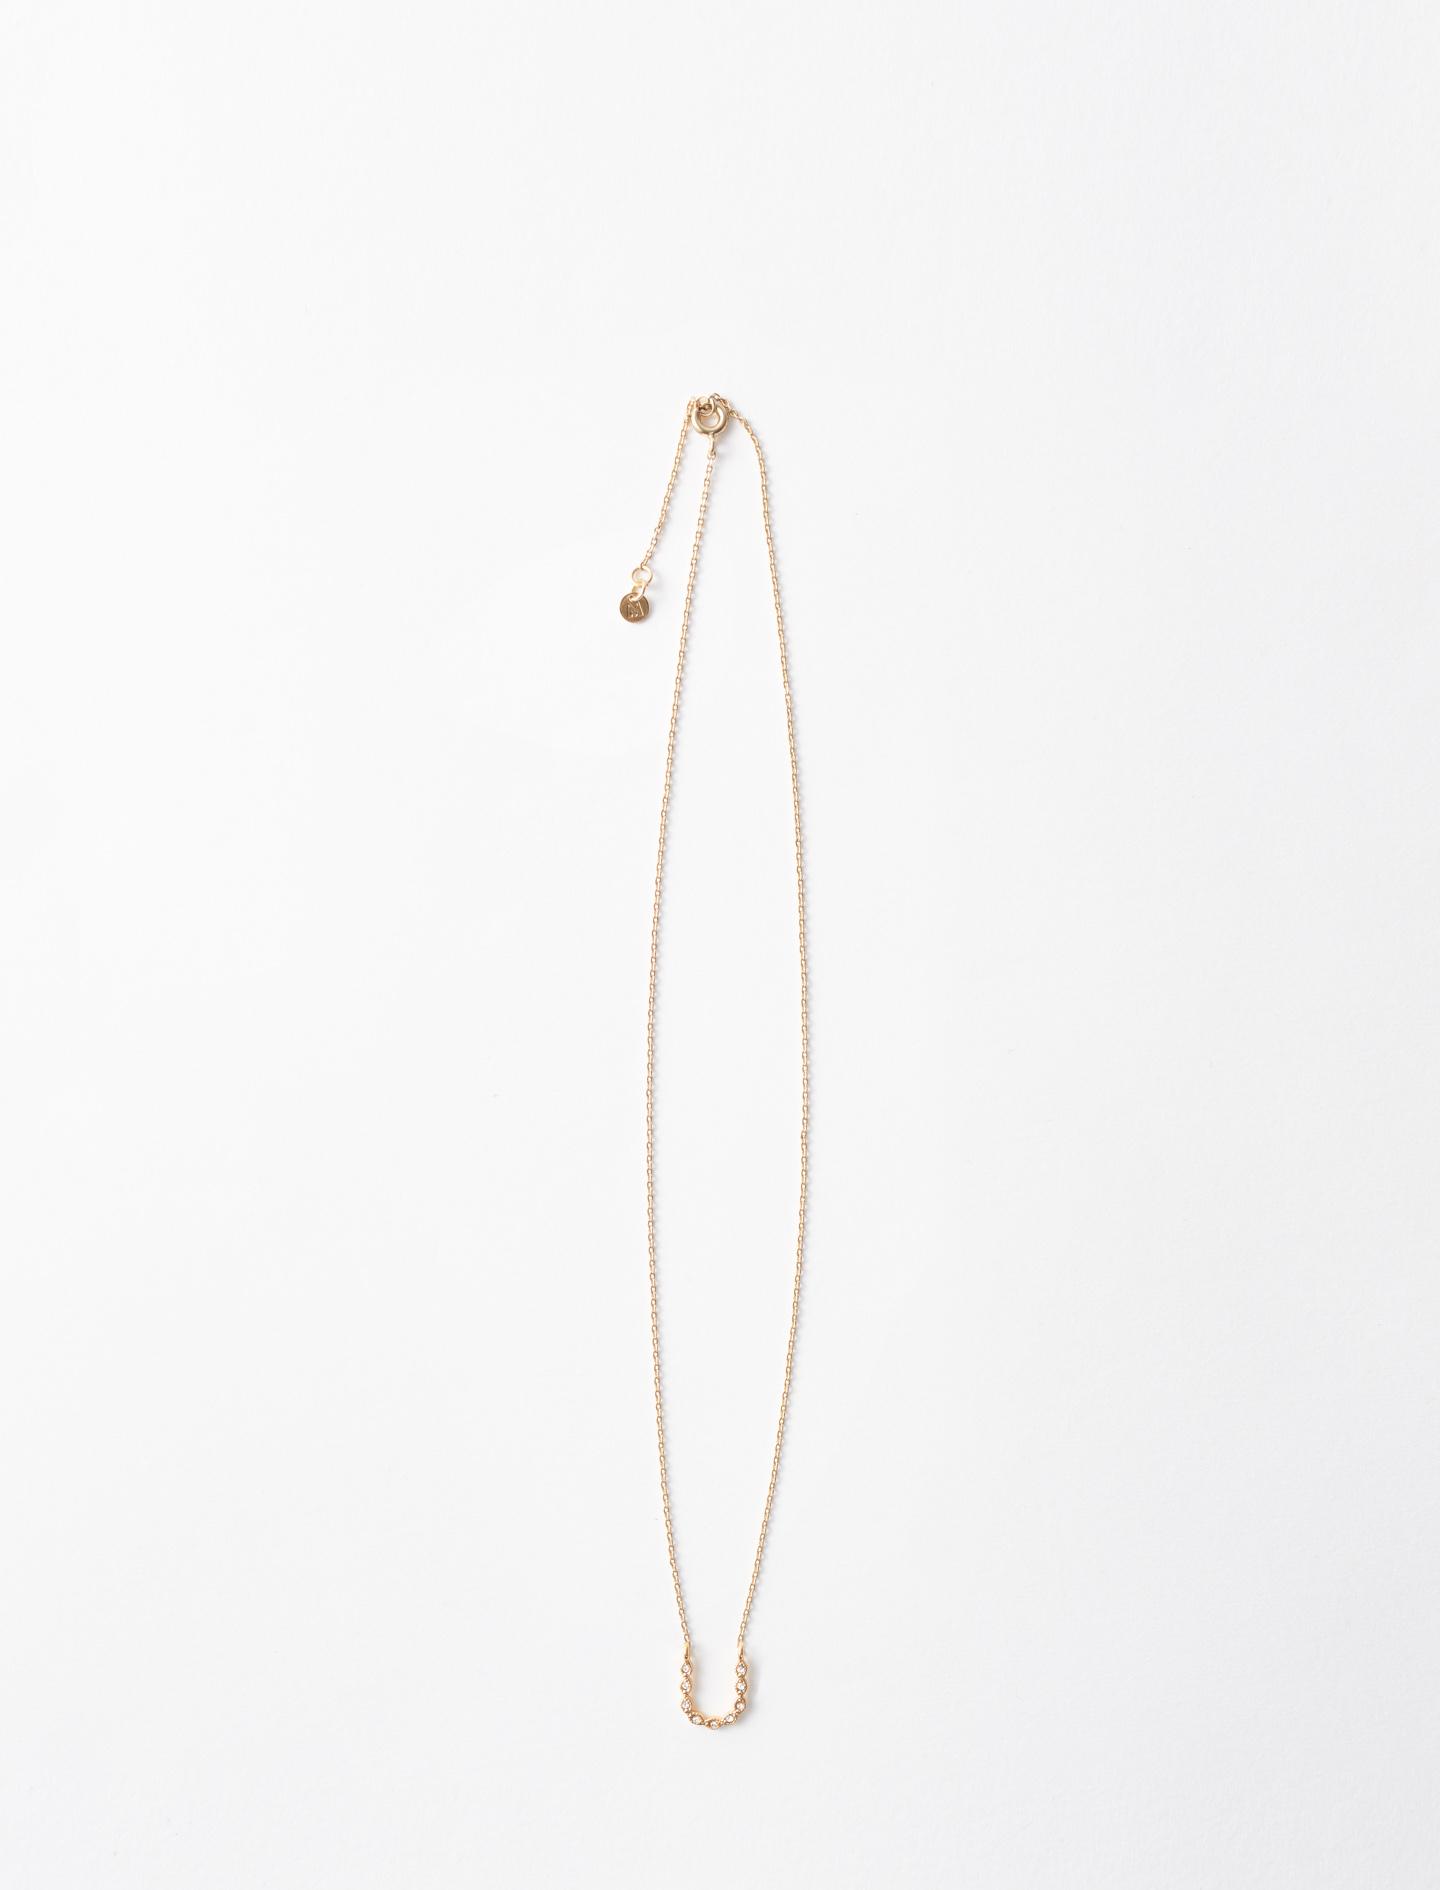 Rhinestone U necklace - Gold